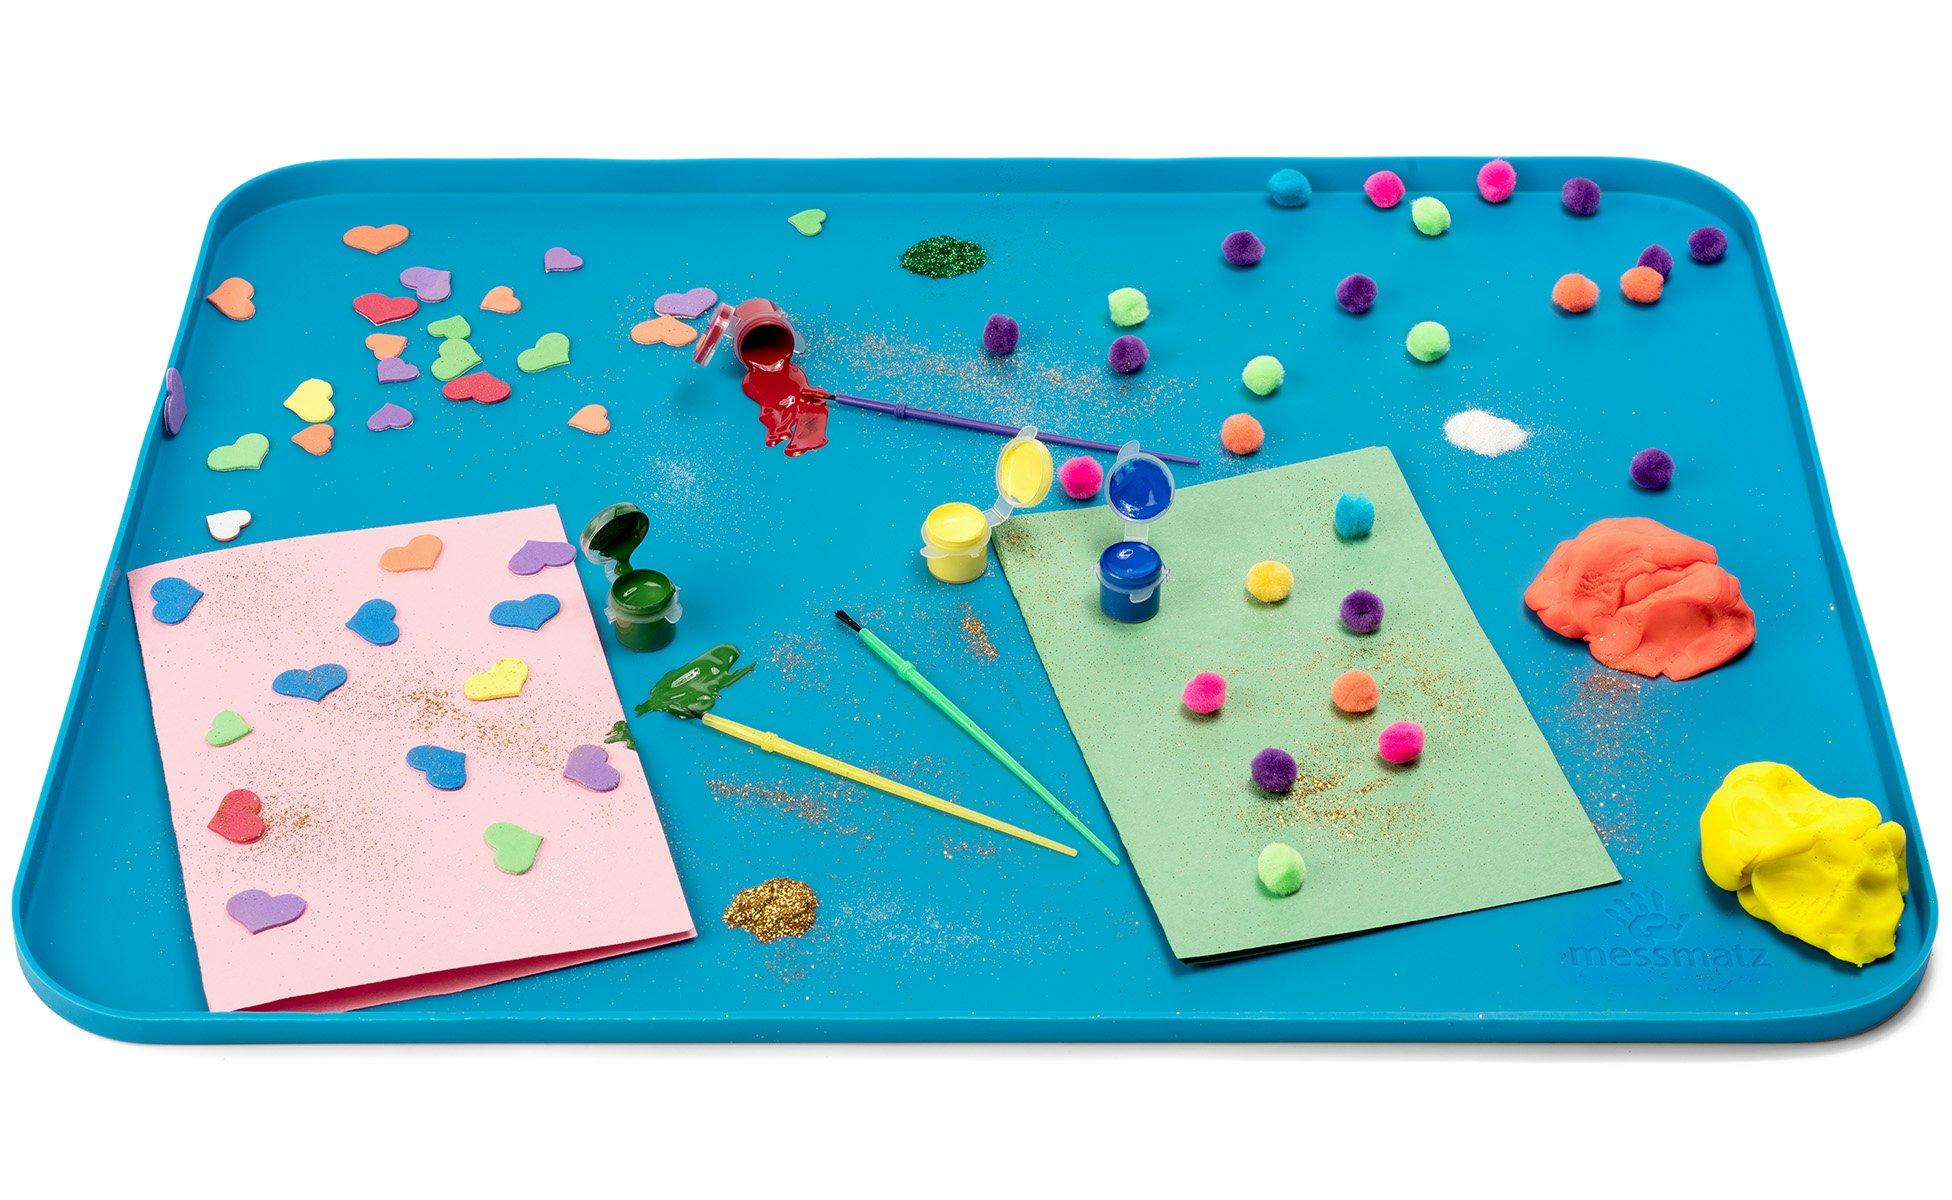 PlaSmart MM0B Messmatz - Blue, kindergarten Grade to 3 Grade